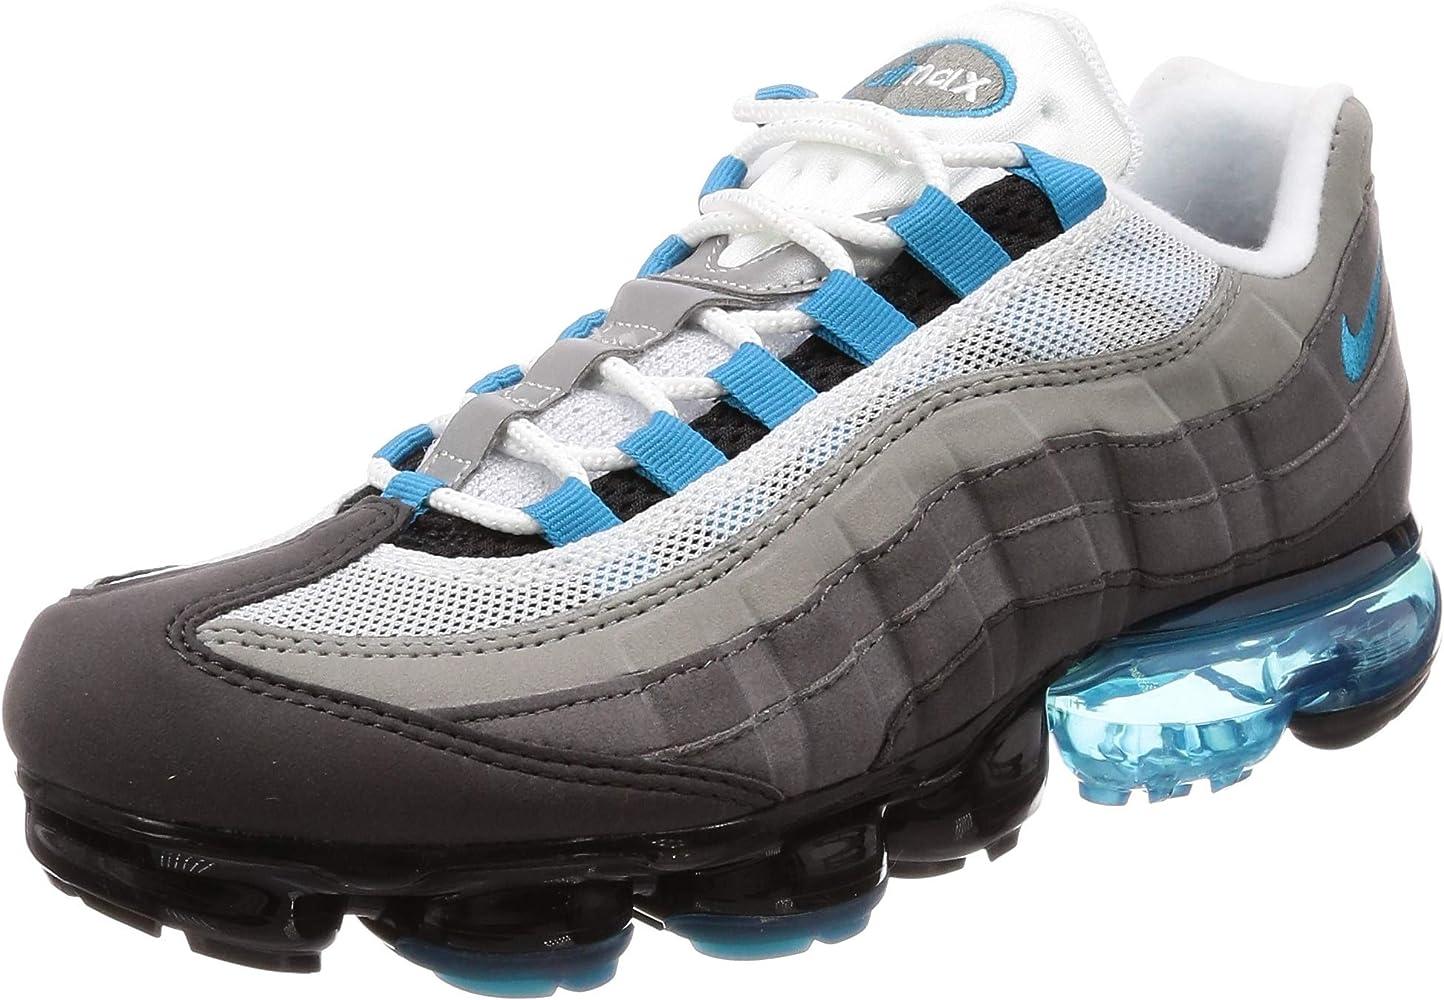 Nike Men's Air Vapormax 95, Black/NEO